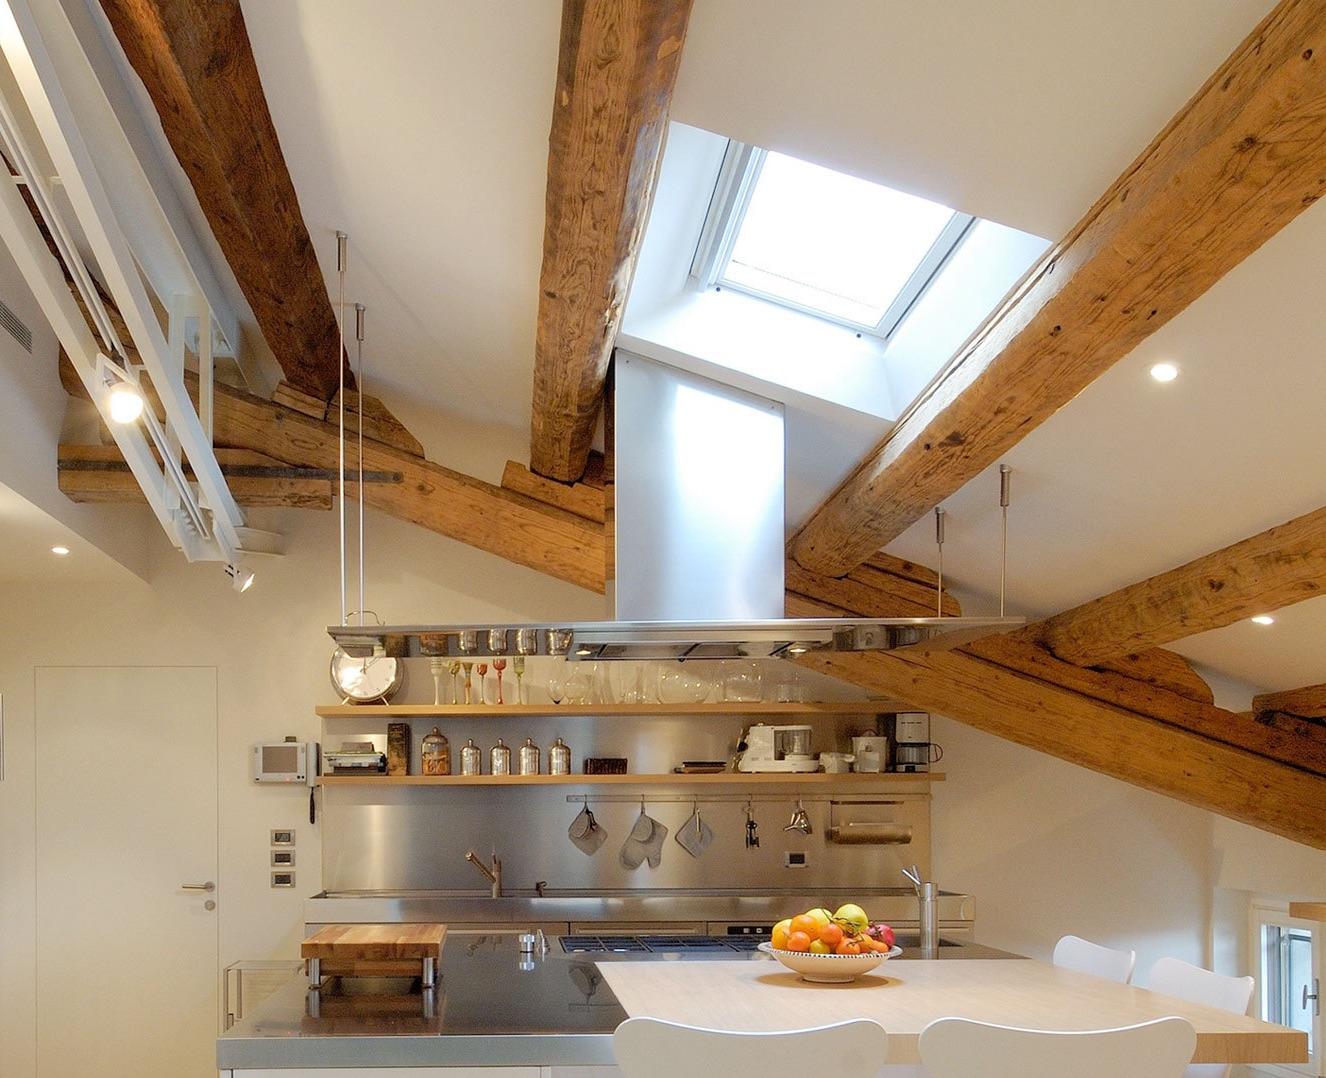 10 idee per rendere la vostra cucina spettacolare - Cucine per mansarda ...